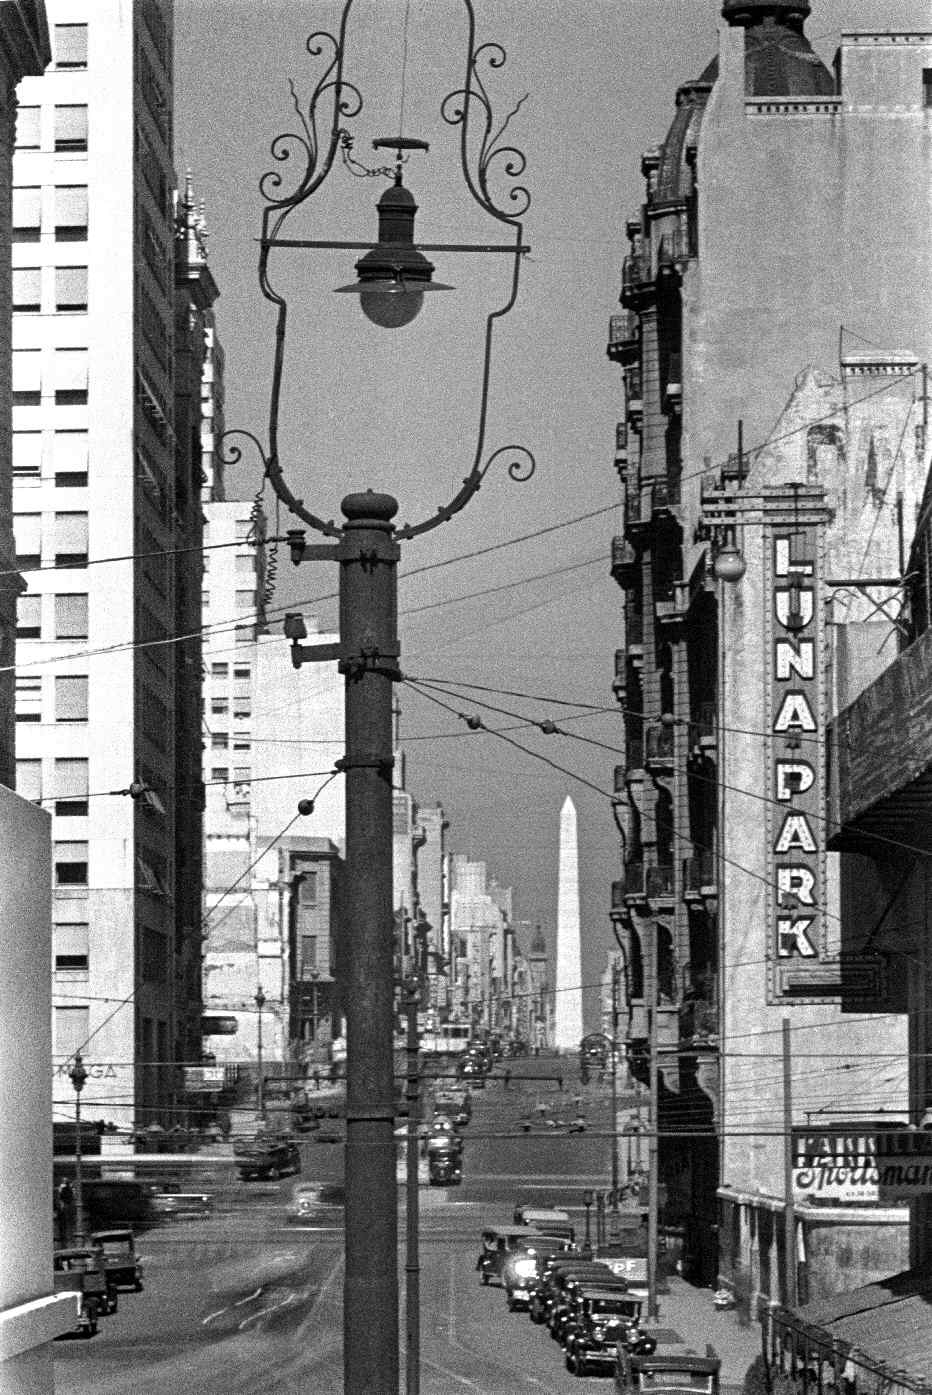 Paseo por la calle en brasil 25 - 5 2